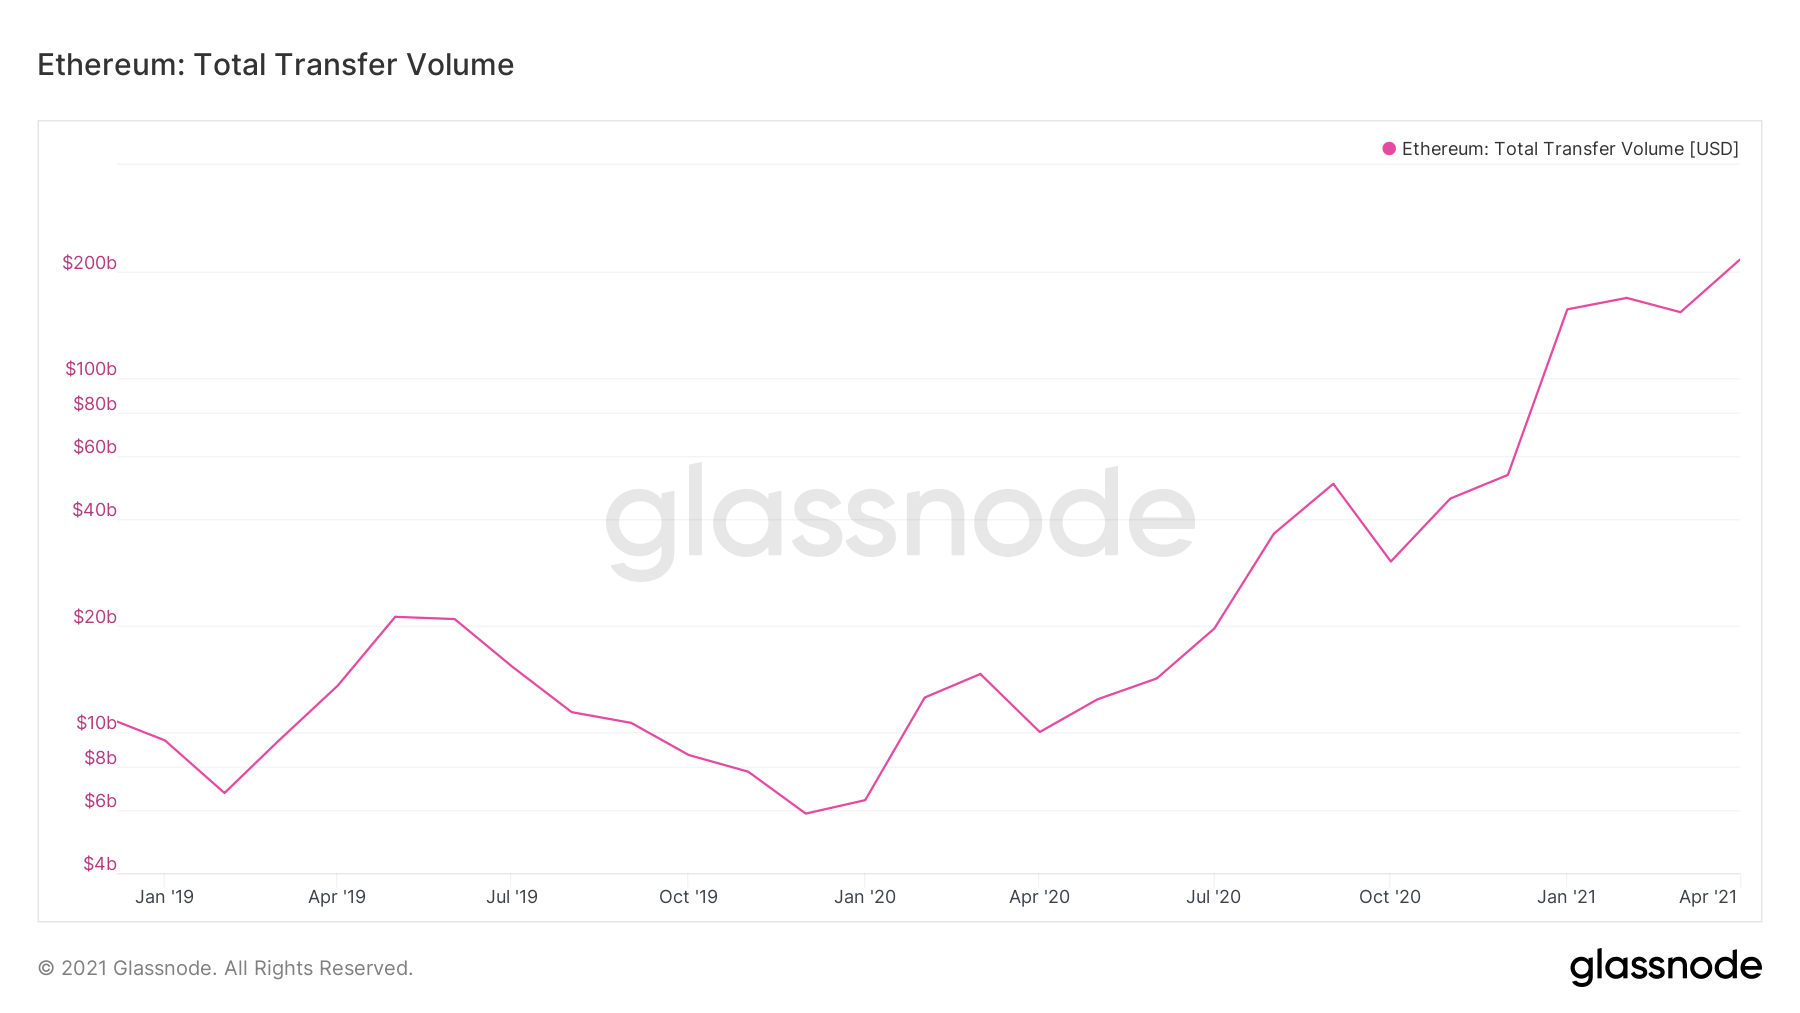 Ethereum total transfer volume chart